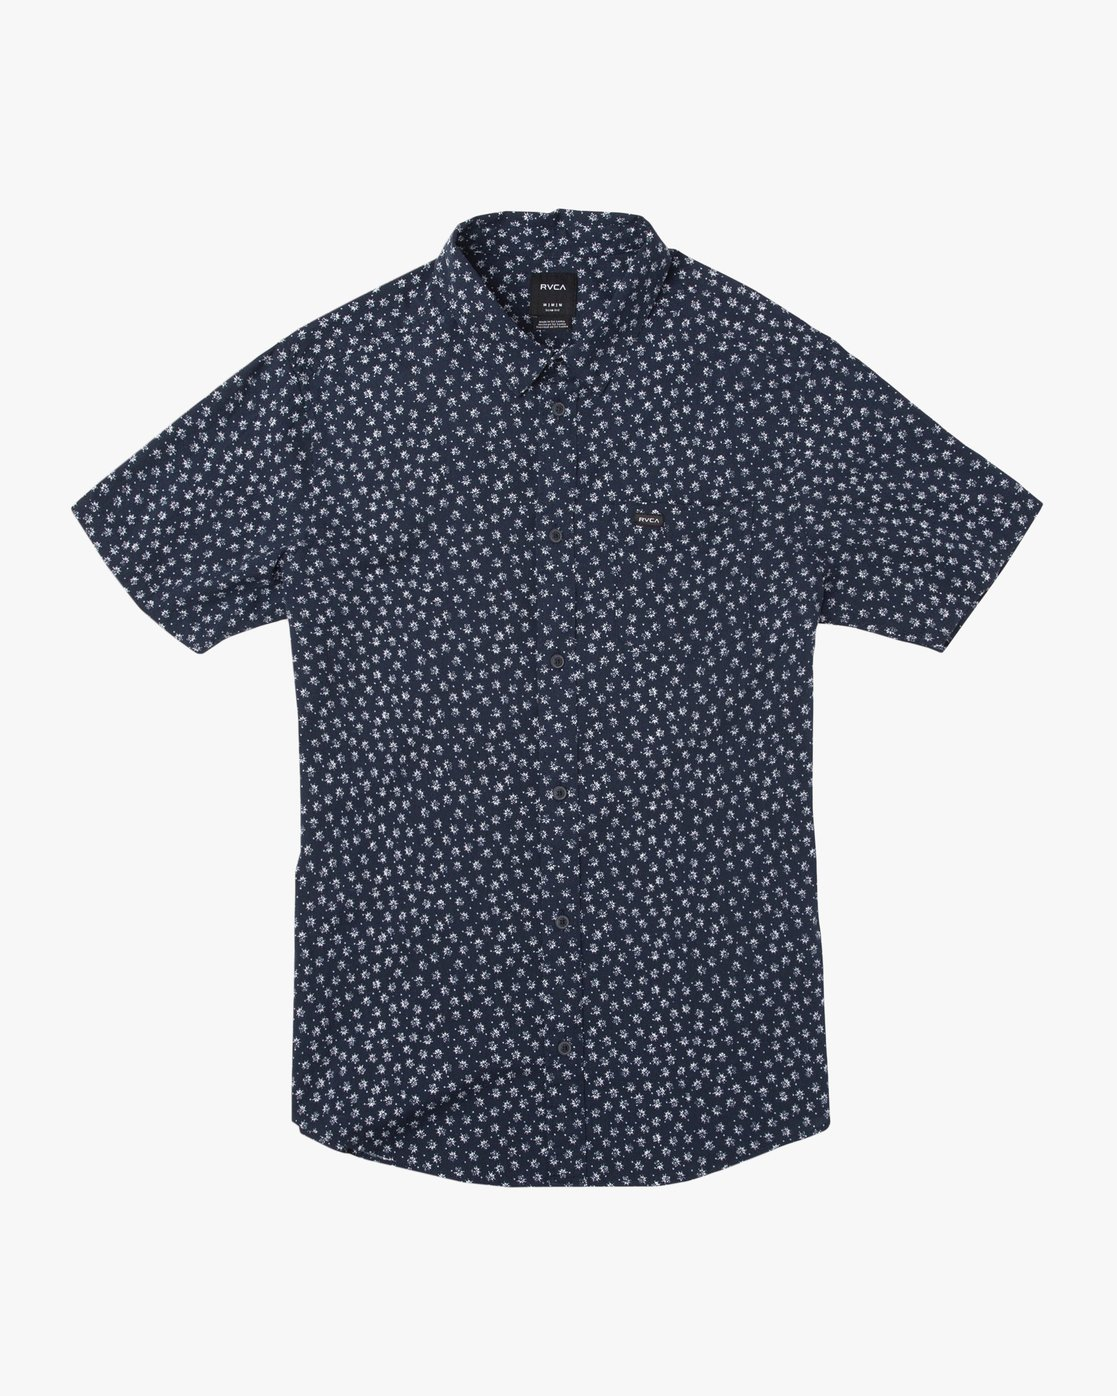 0 Ficus Floral Button-Up Shirt Blue M520TRBF RVCA